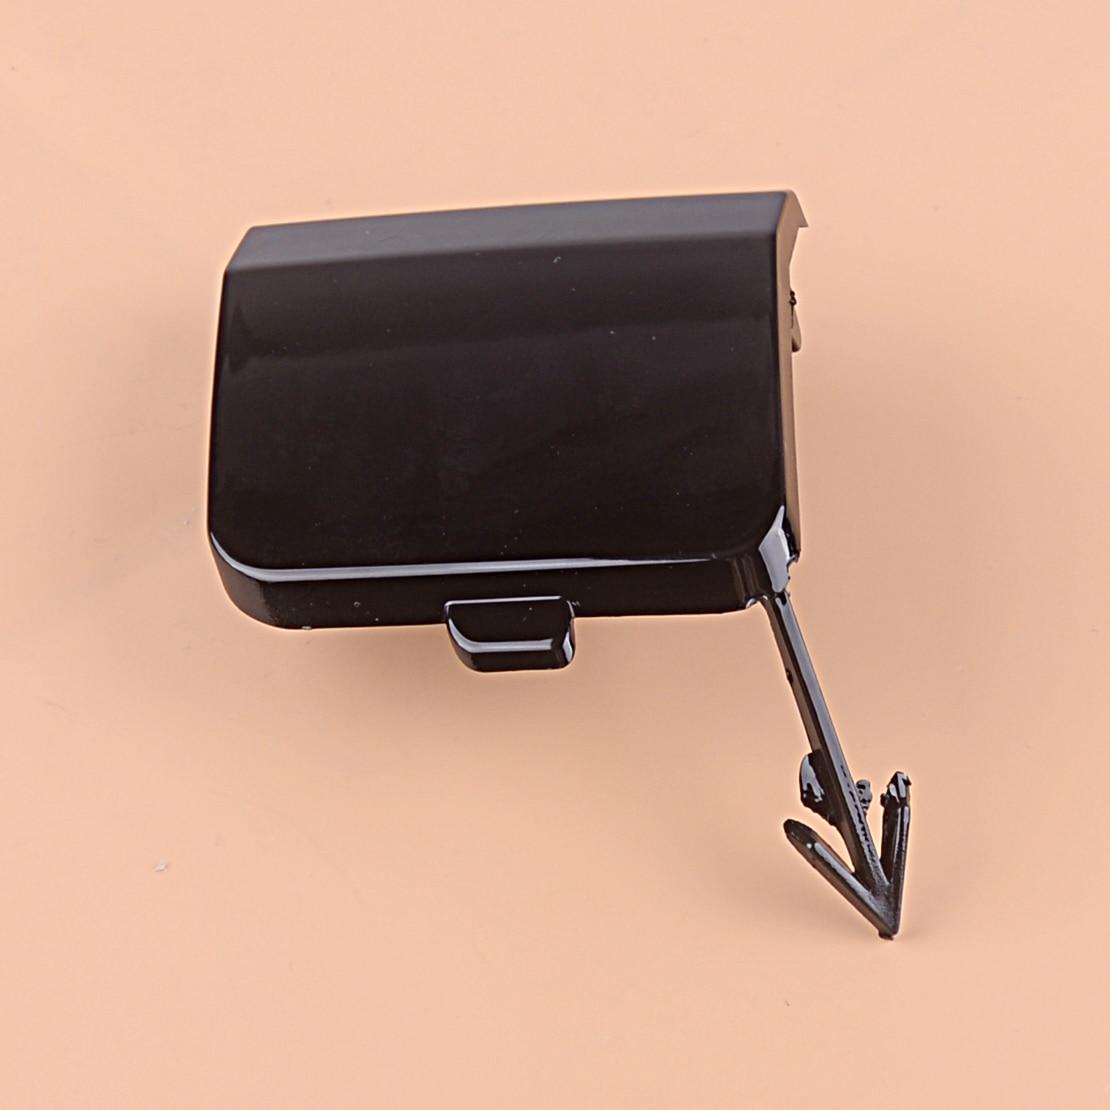 Beler amortecedor traseiro gancho de reboque capa para os olhos apto para vw golf r20 mk6 6 rline 2009 2010 2011 2012 2013 5k6807441f